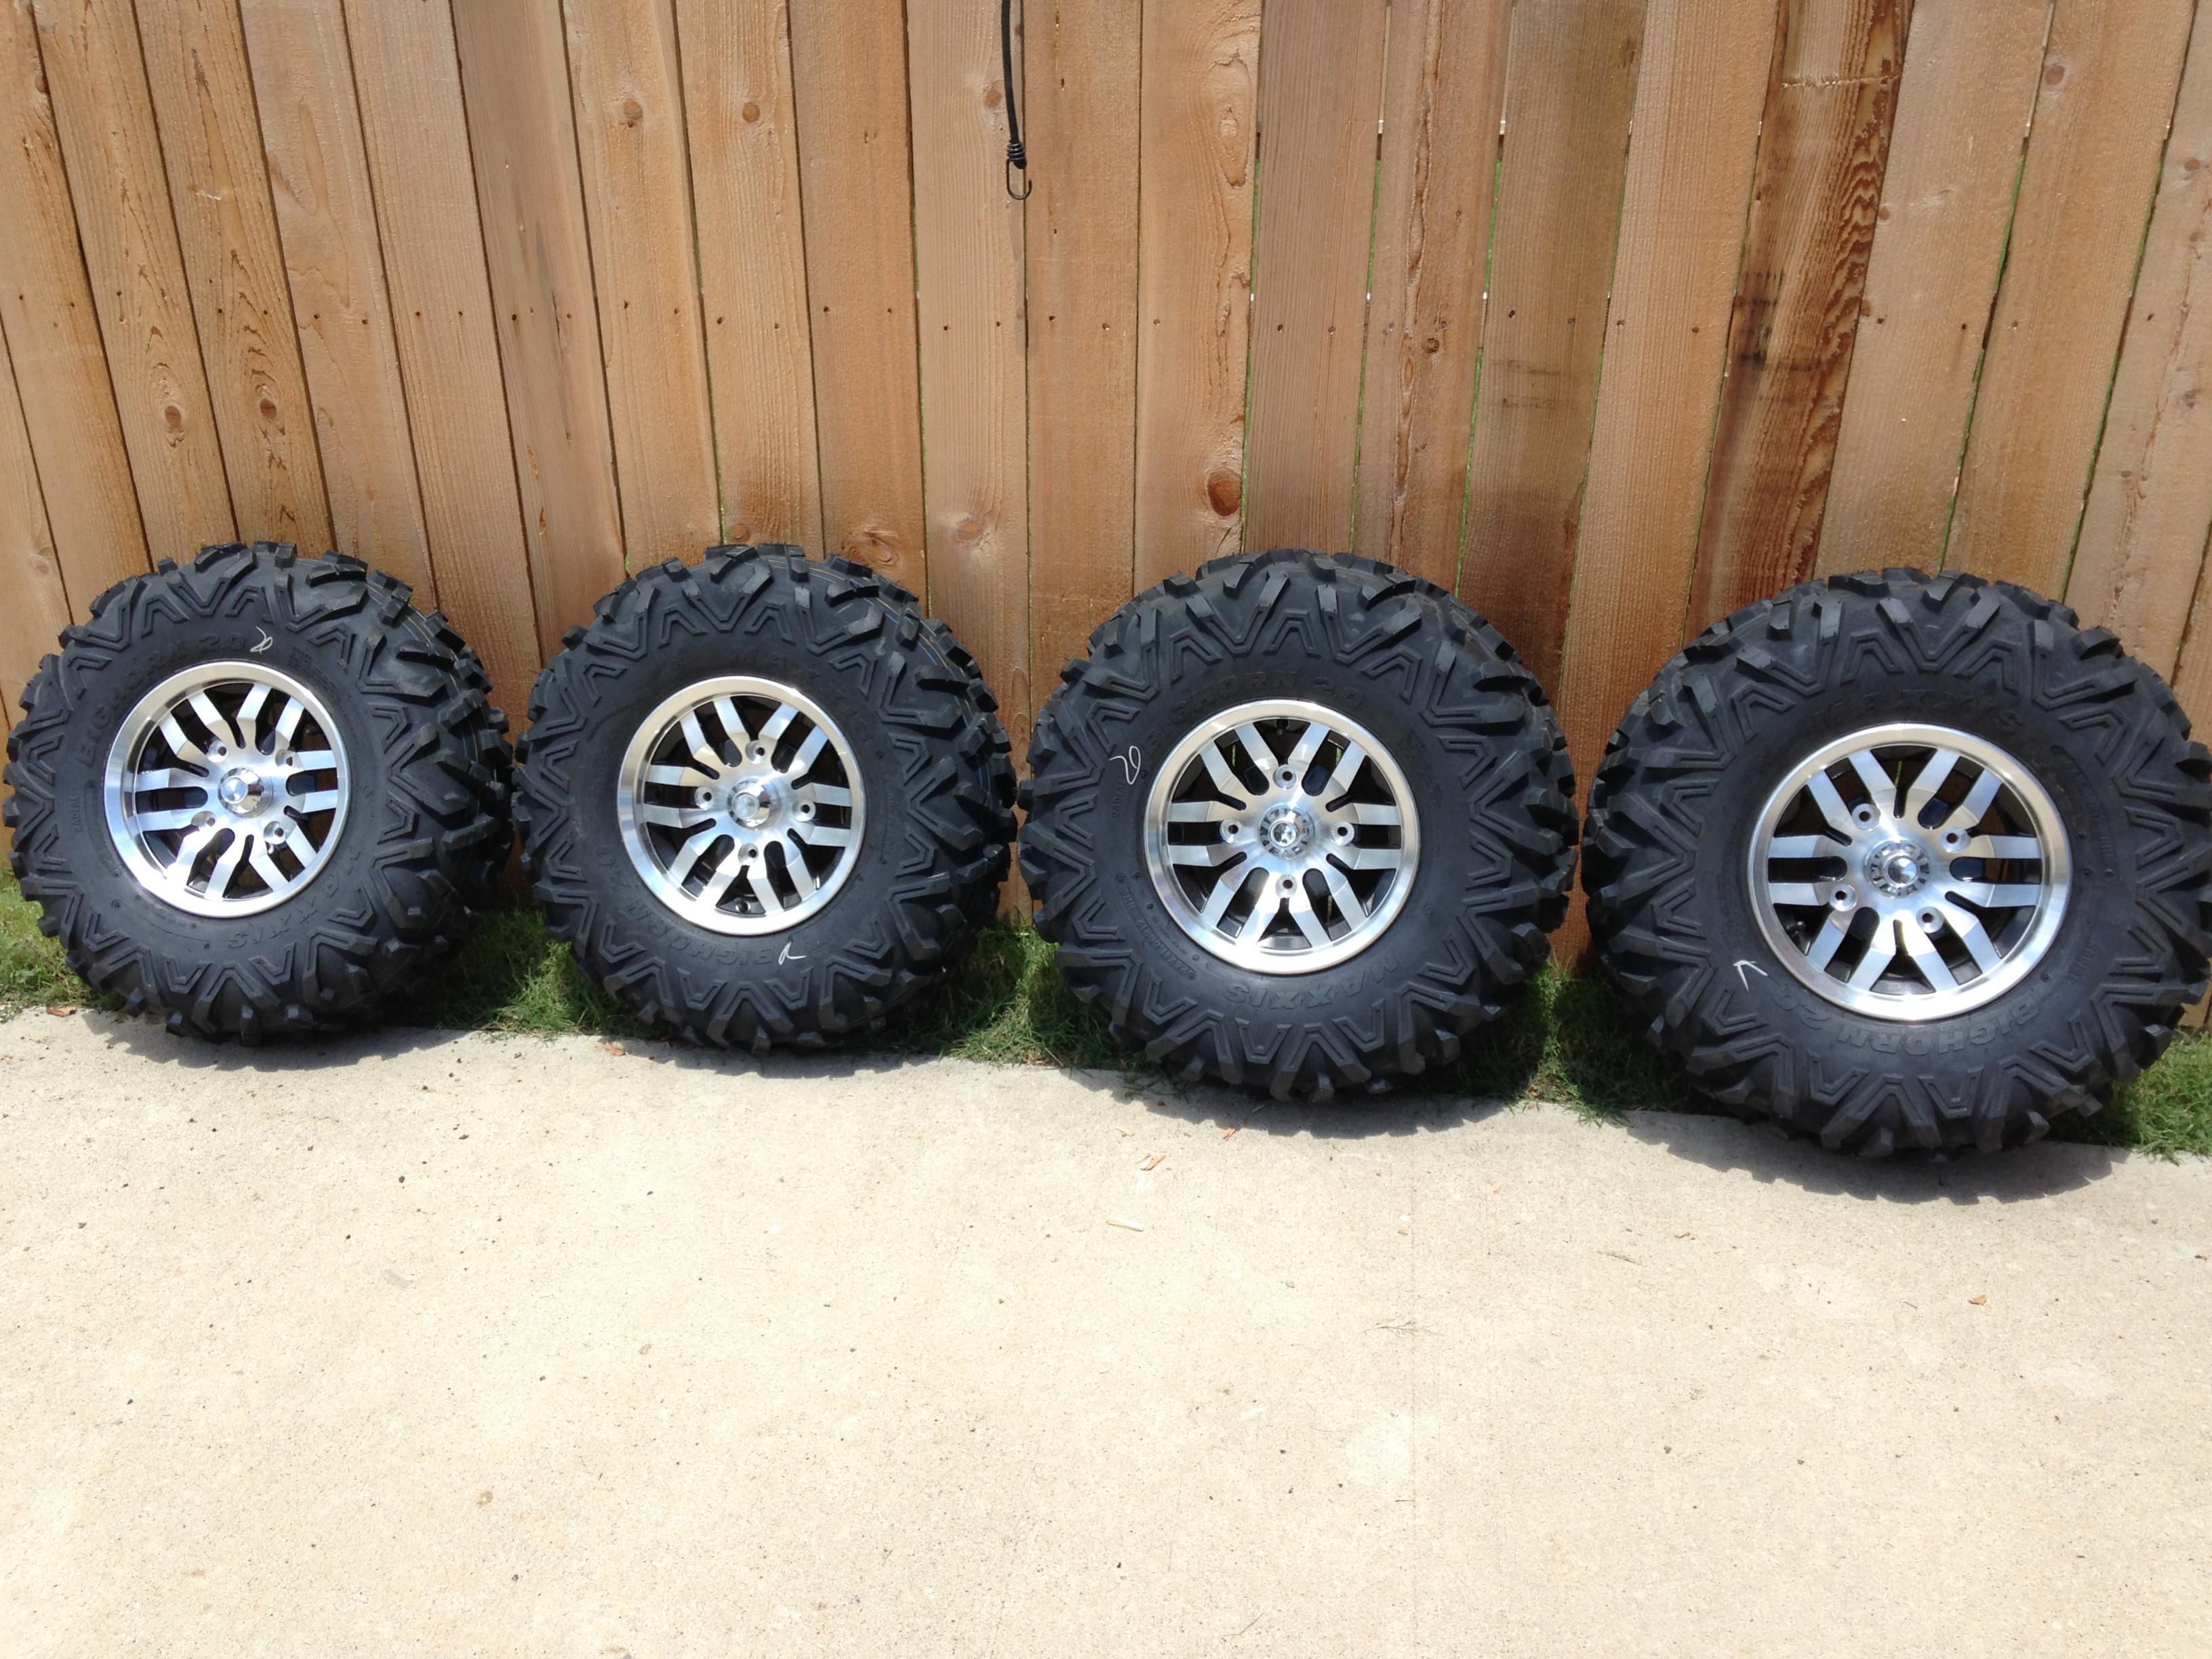 How To Buy Tires >> Stock 2014 Teryx4 LE Wheels/Tires 4 Sale - Kawasaki Teryx Forum